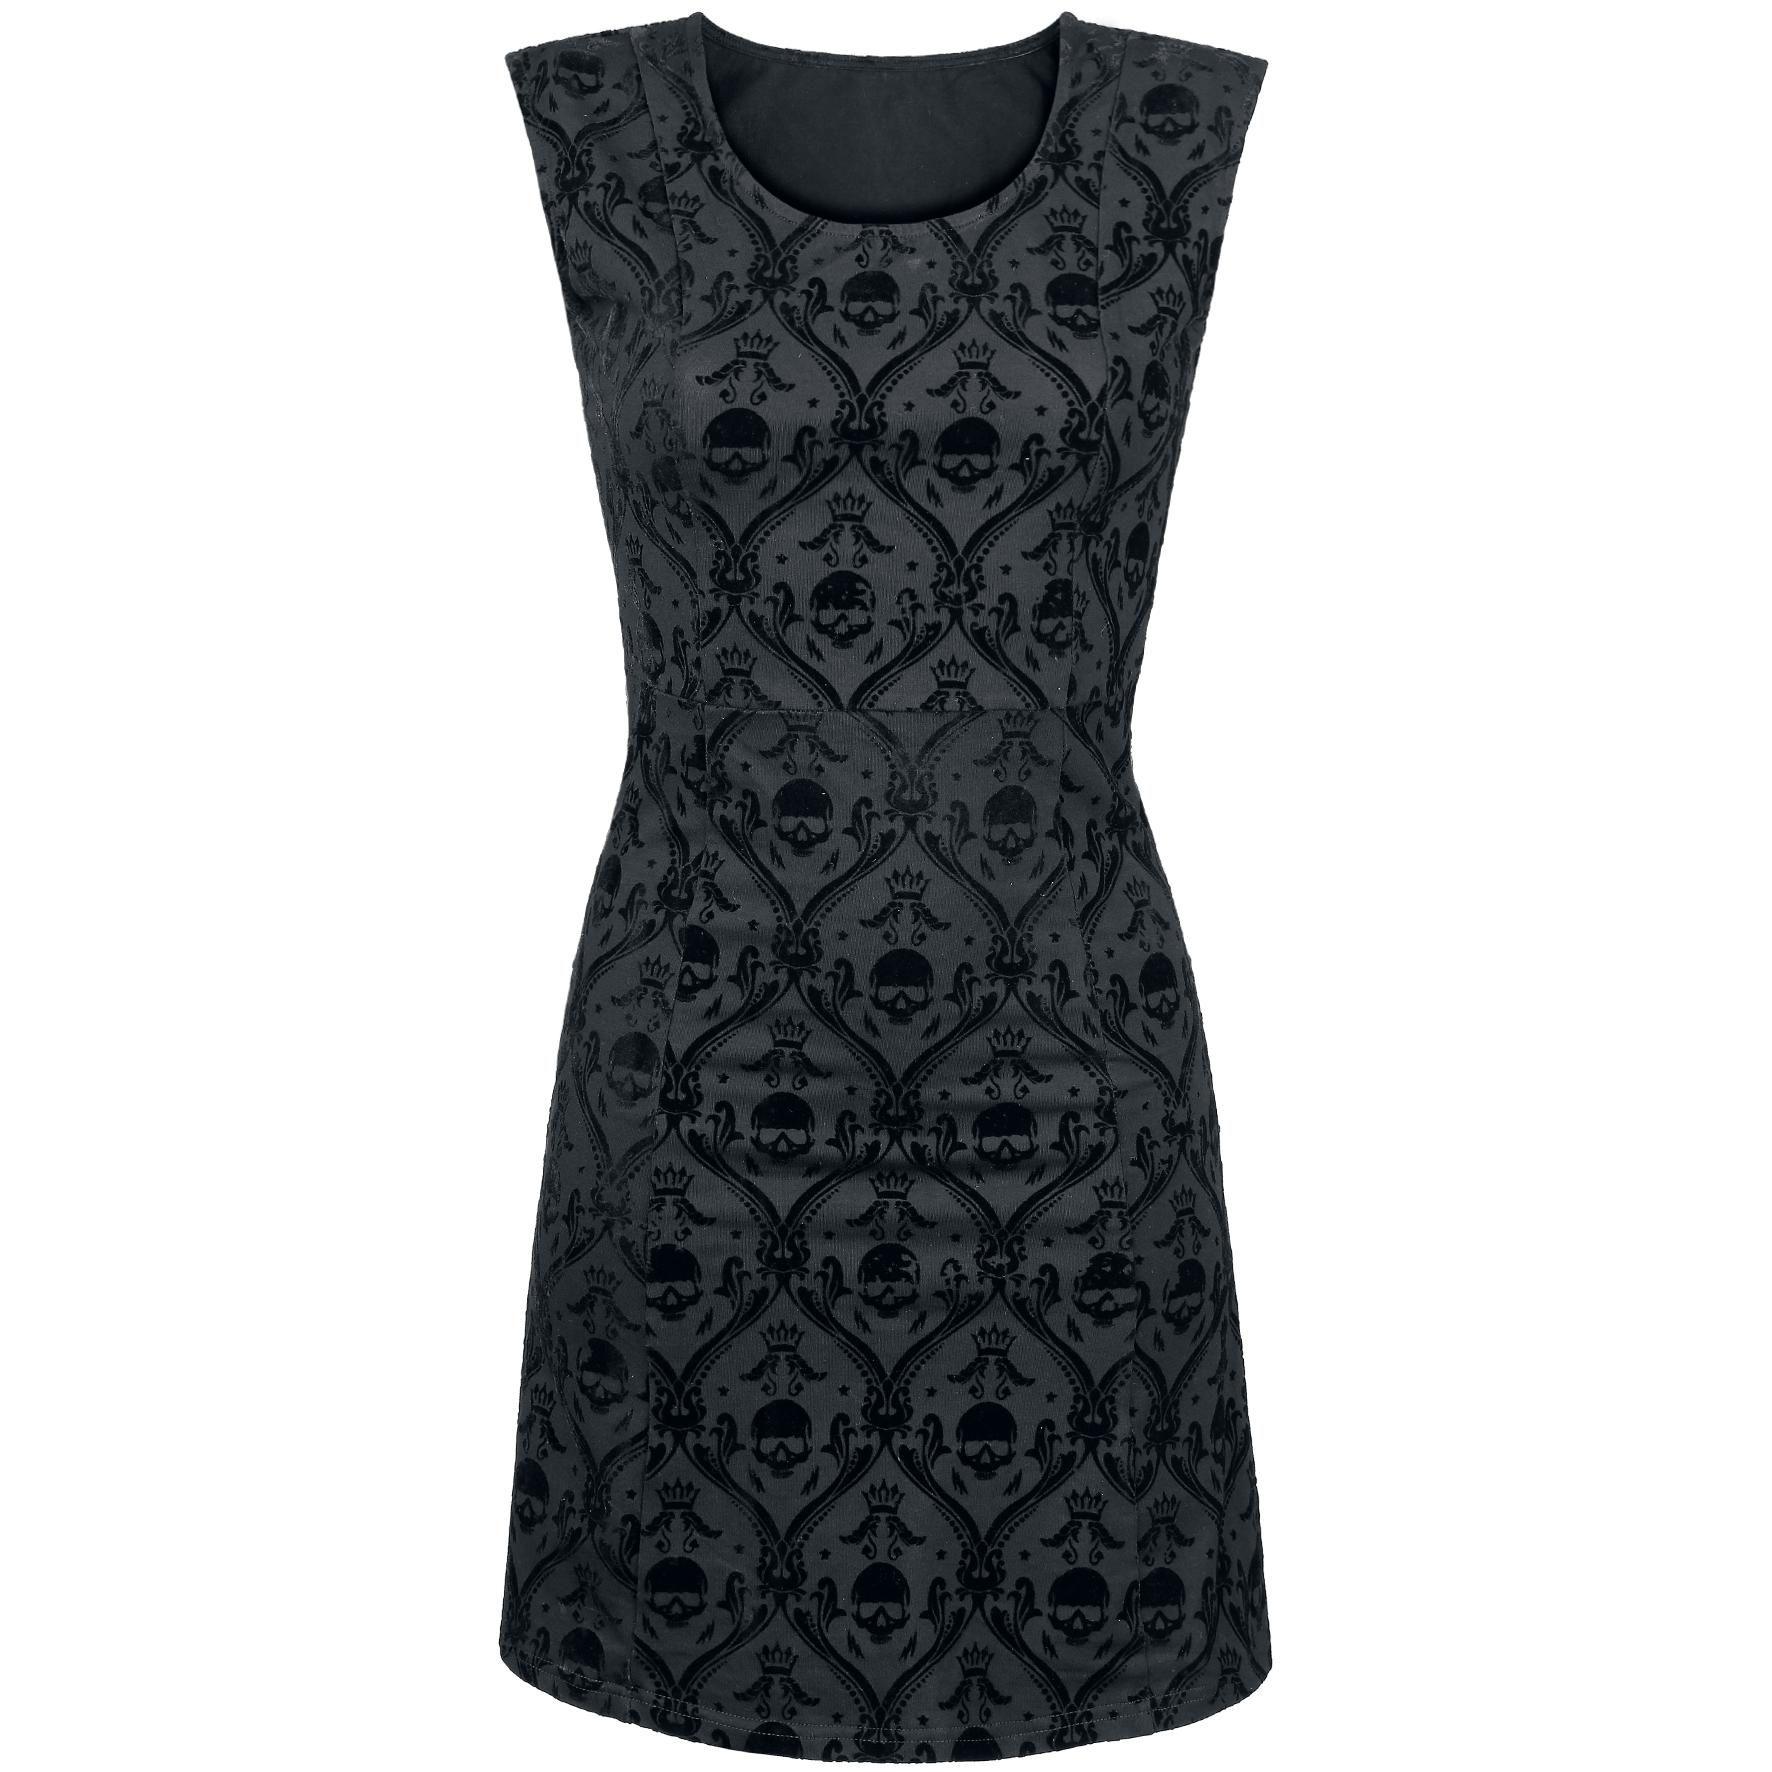 EMP Merchandise   Fanartikel Shop für Rock   Entertainment. Skull DressCool  DressesBlack ... f2b4a87bf0